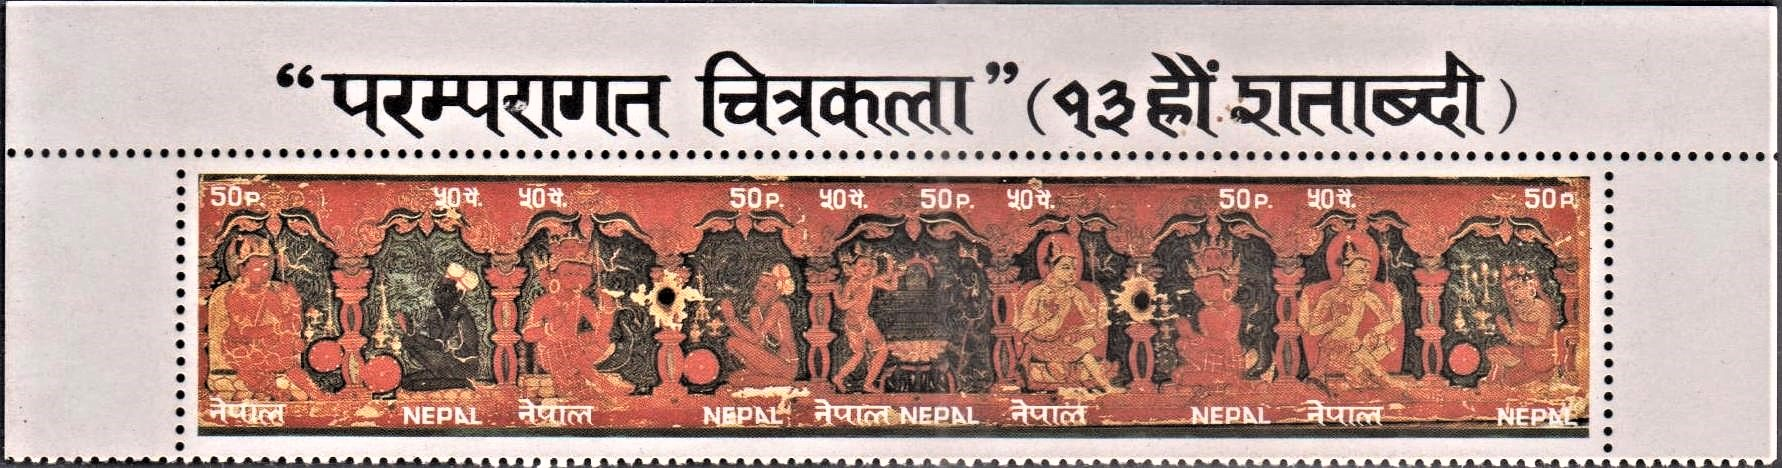 Shiva Dharma Purana : श्रीमद्शिवधर्मपुराणम्